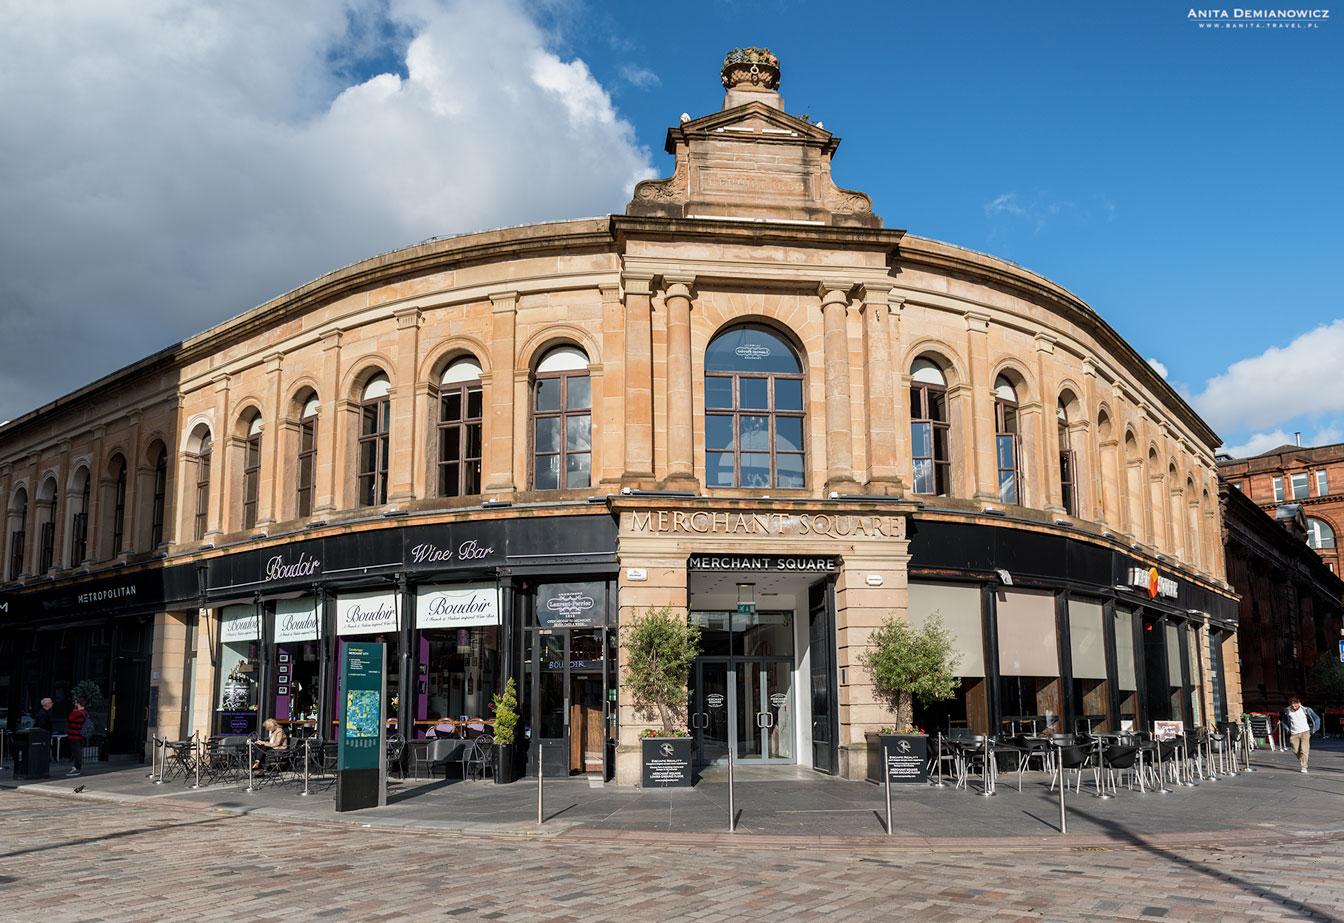 Merchant Square, Szkocja, Glasgow